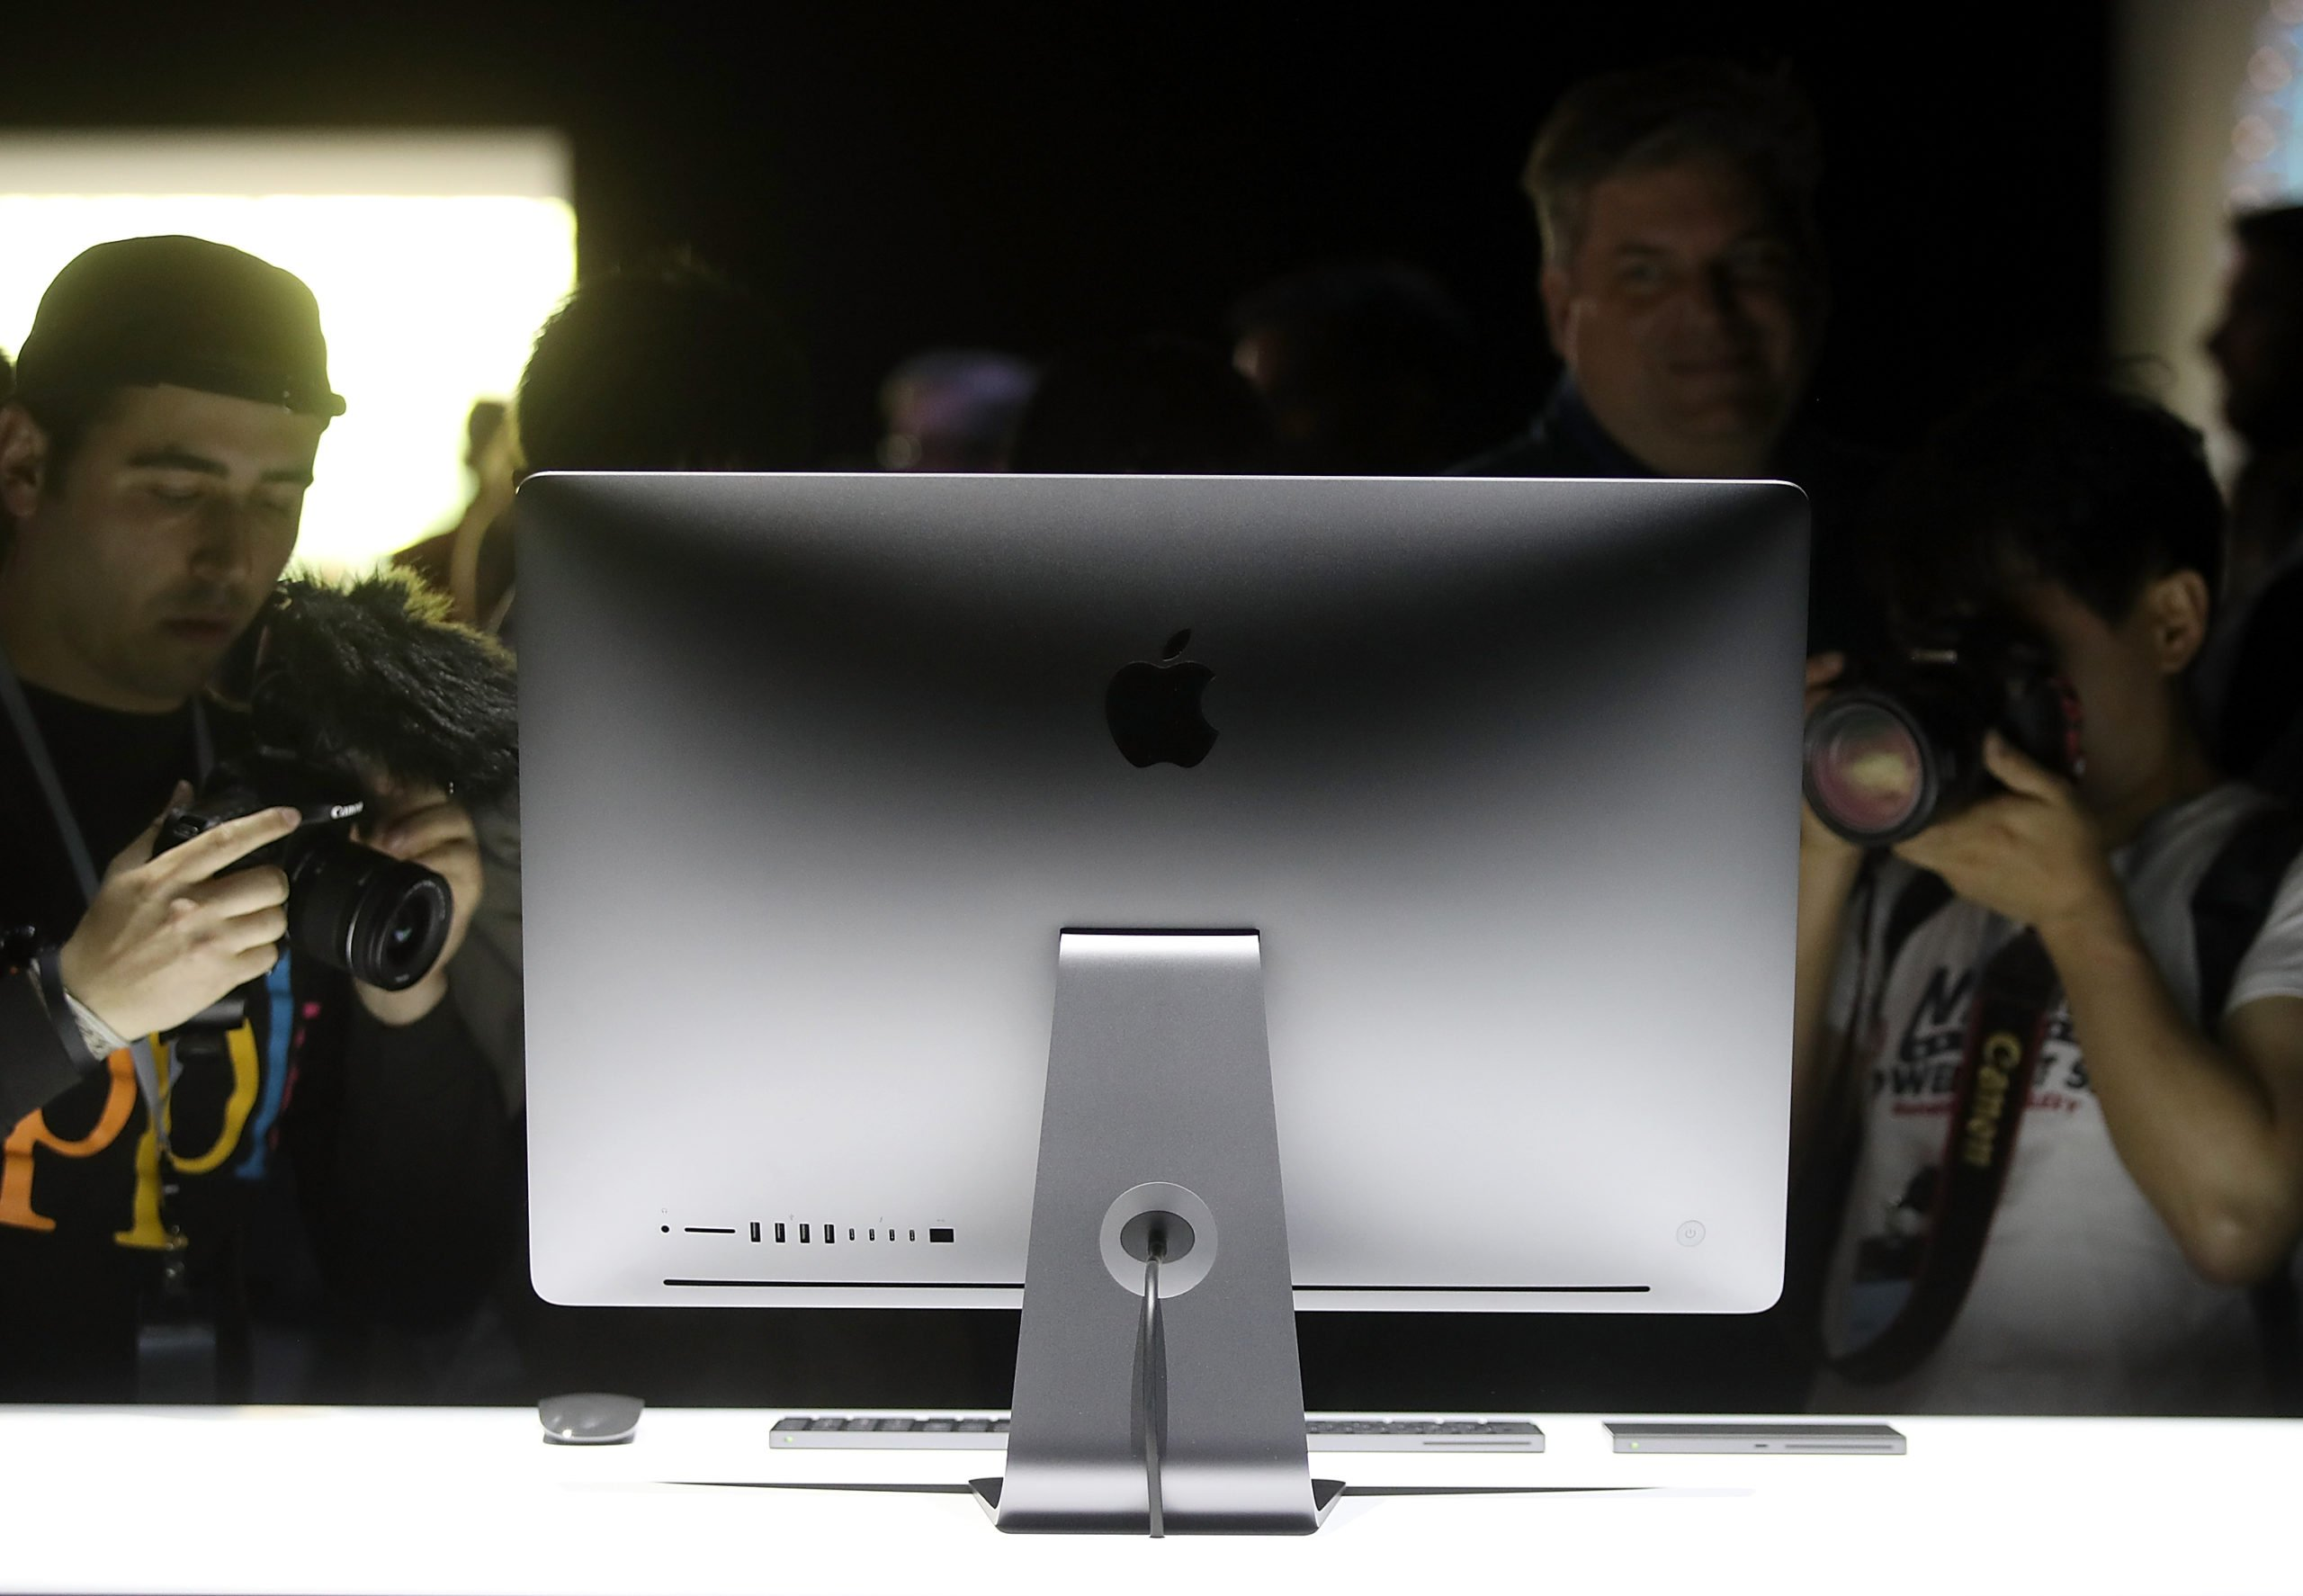 Goodbye iMac Pro: Apple's Power Mac will soon disappear from range